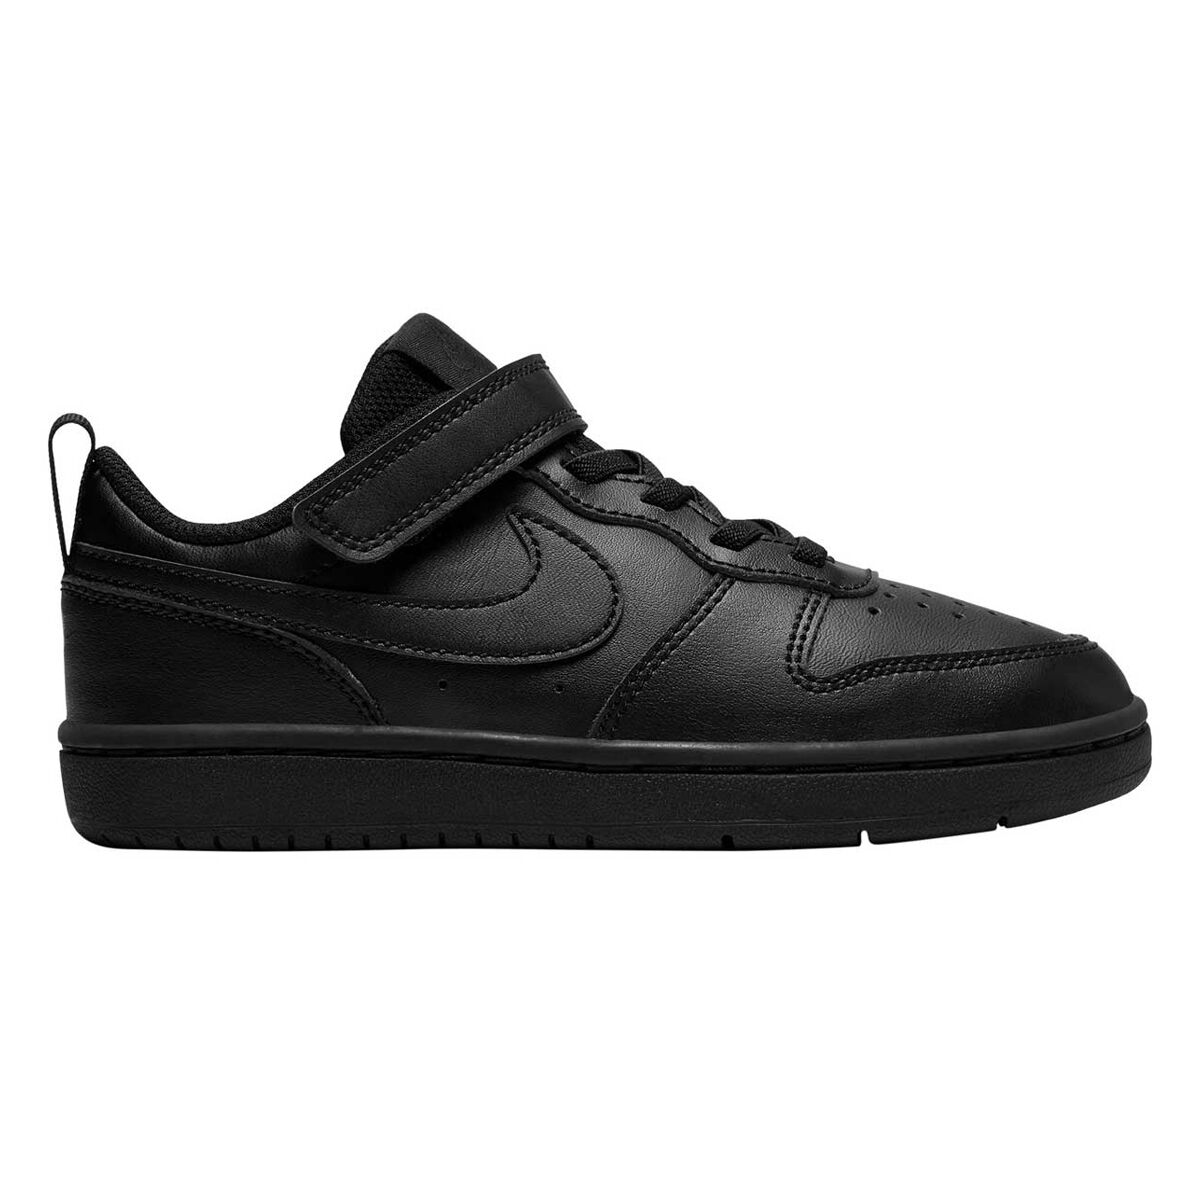 Nike Court Borough Low 2 Big Kids Boys Sneakers